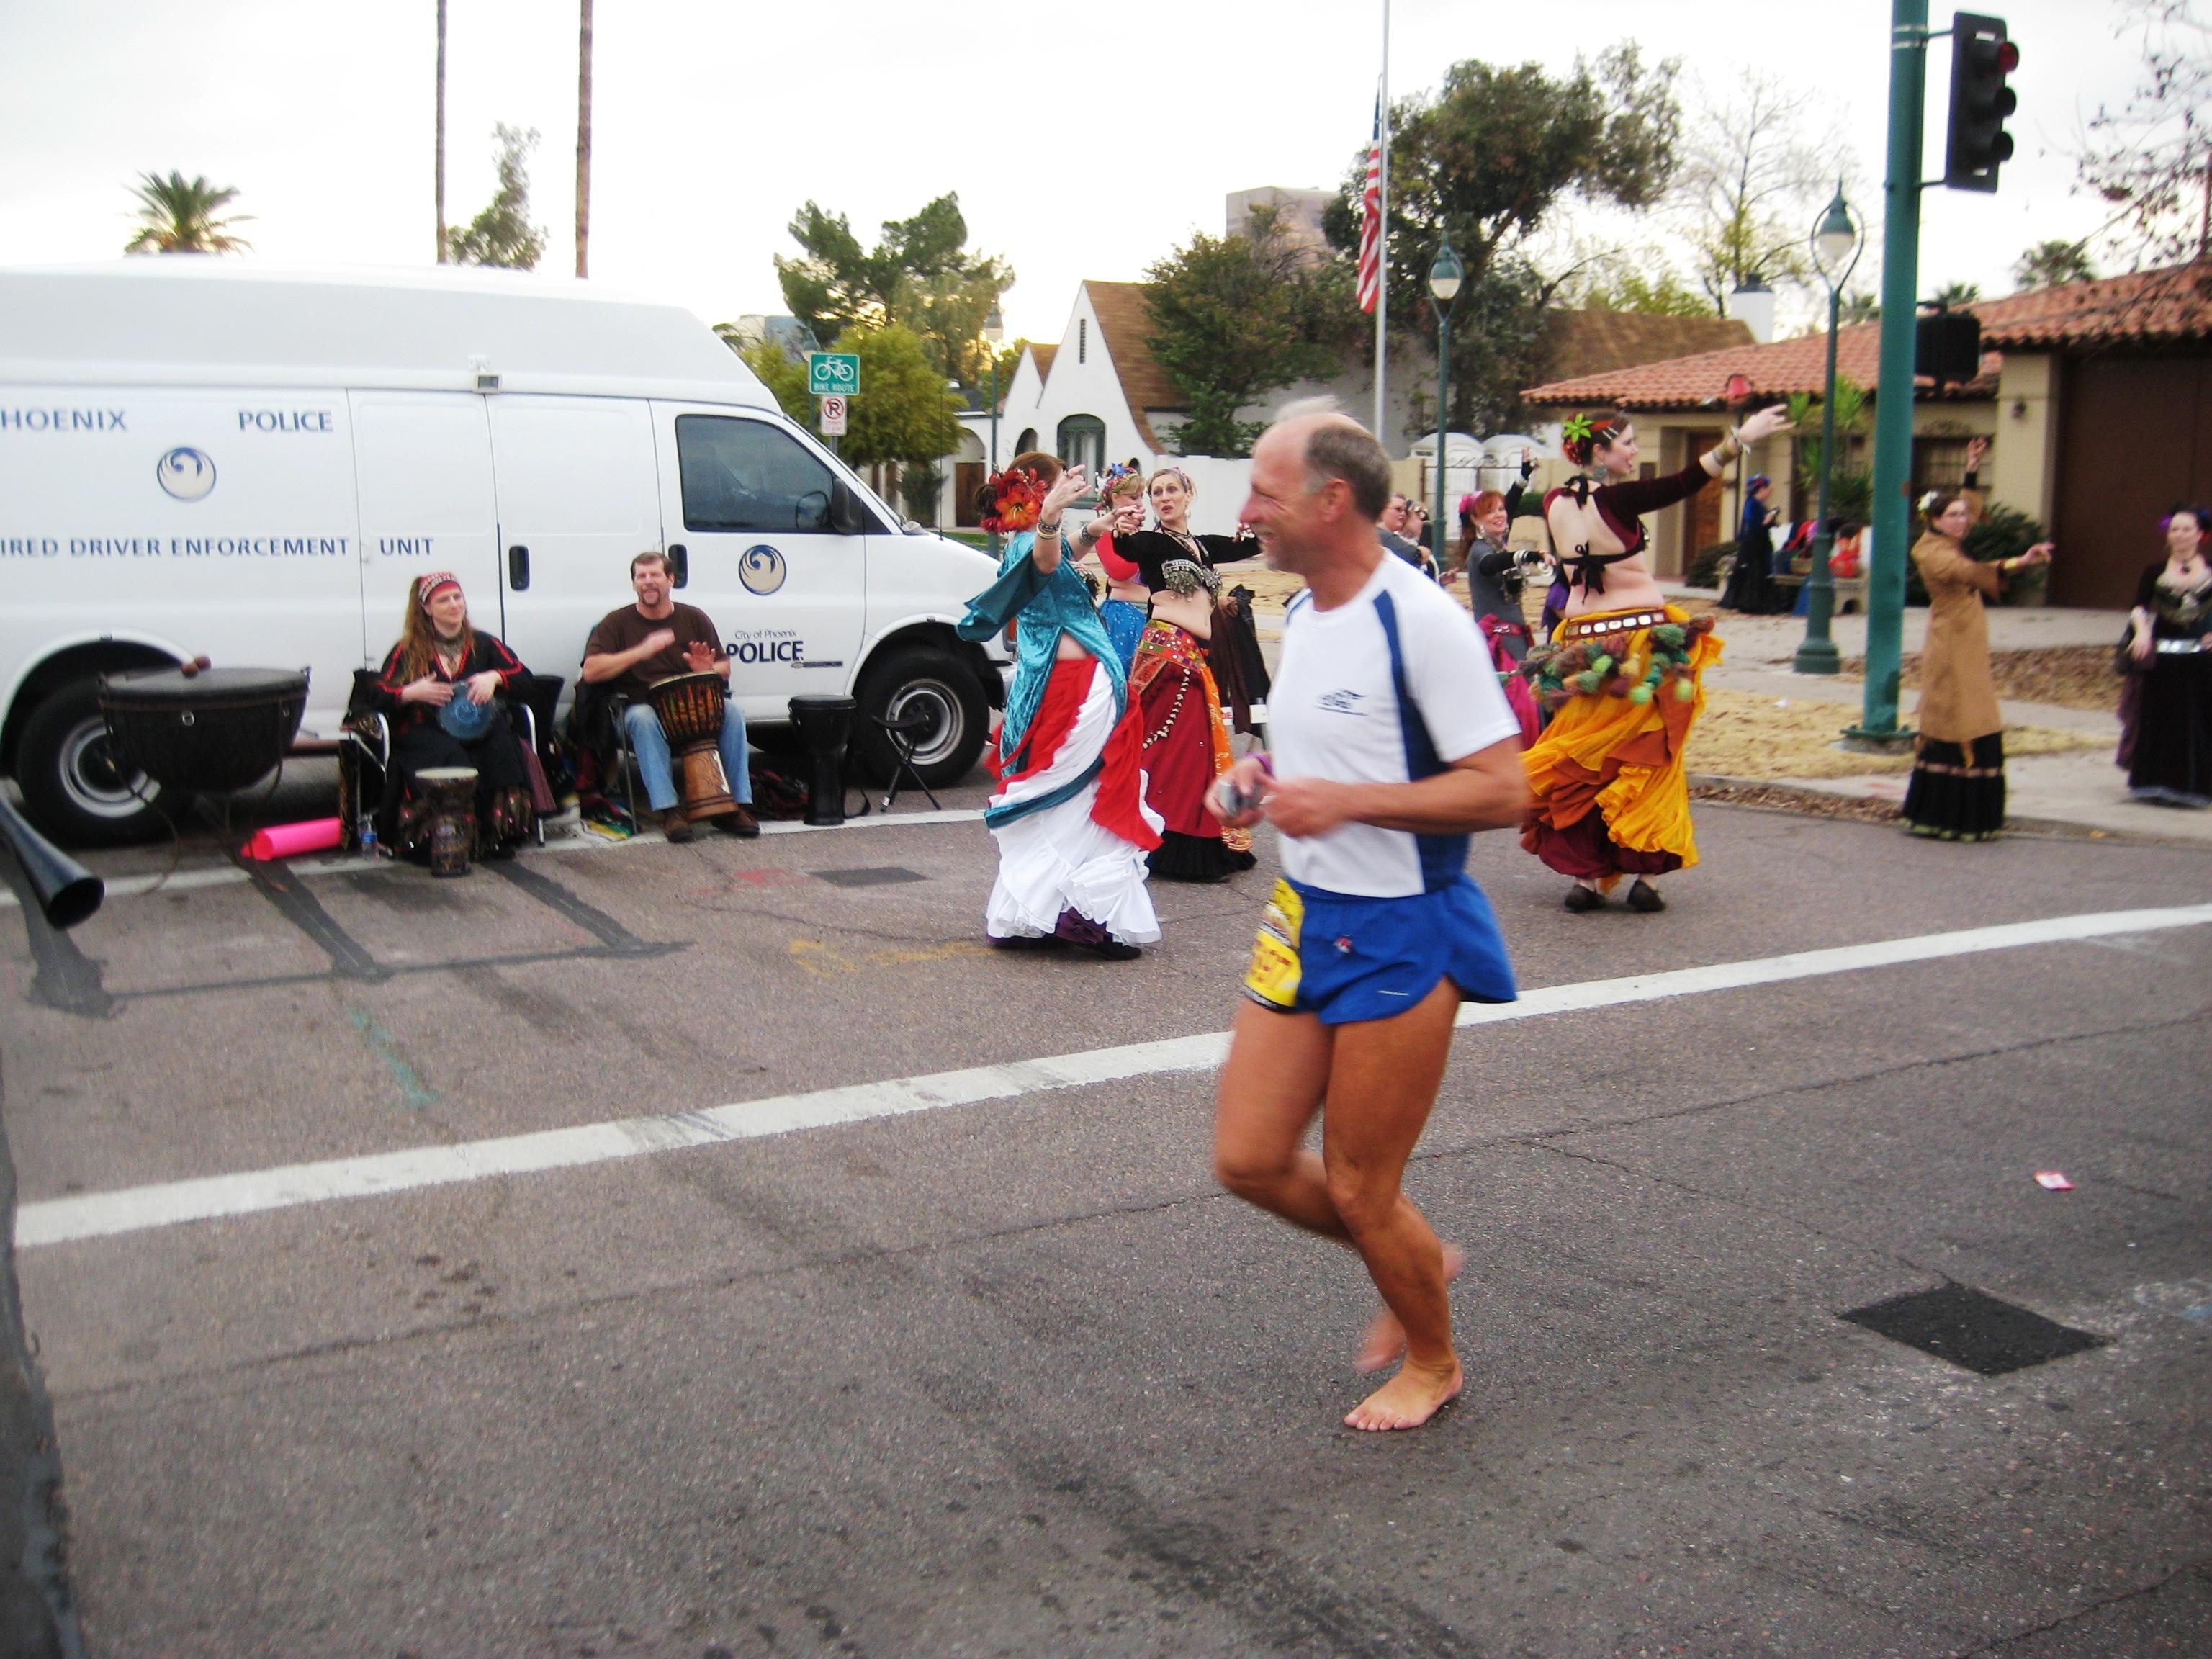 Todd Byers running his 100th barefoot marathon Rock 'n' Roll Arizona 2011 January 16